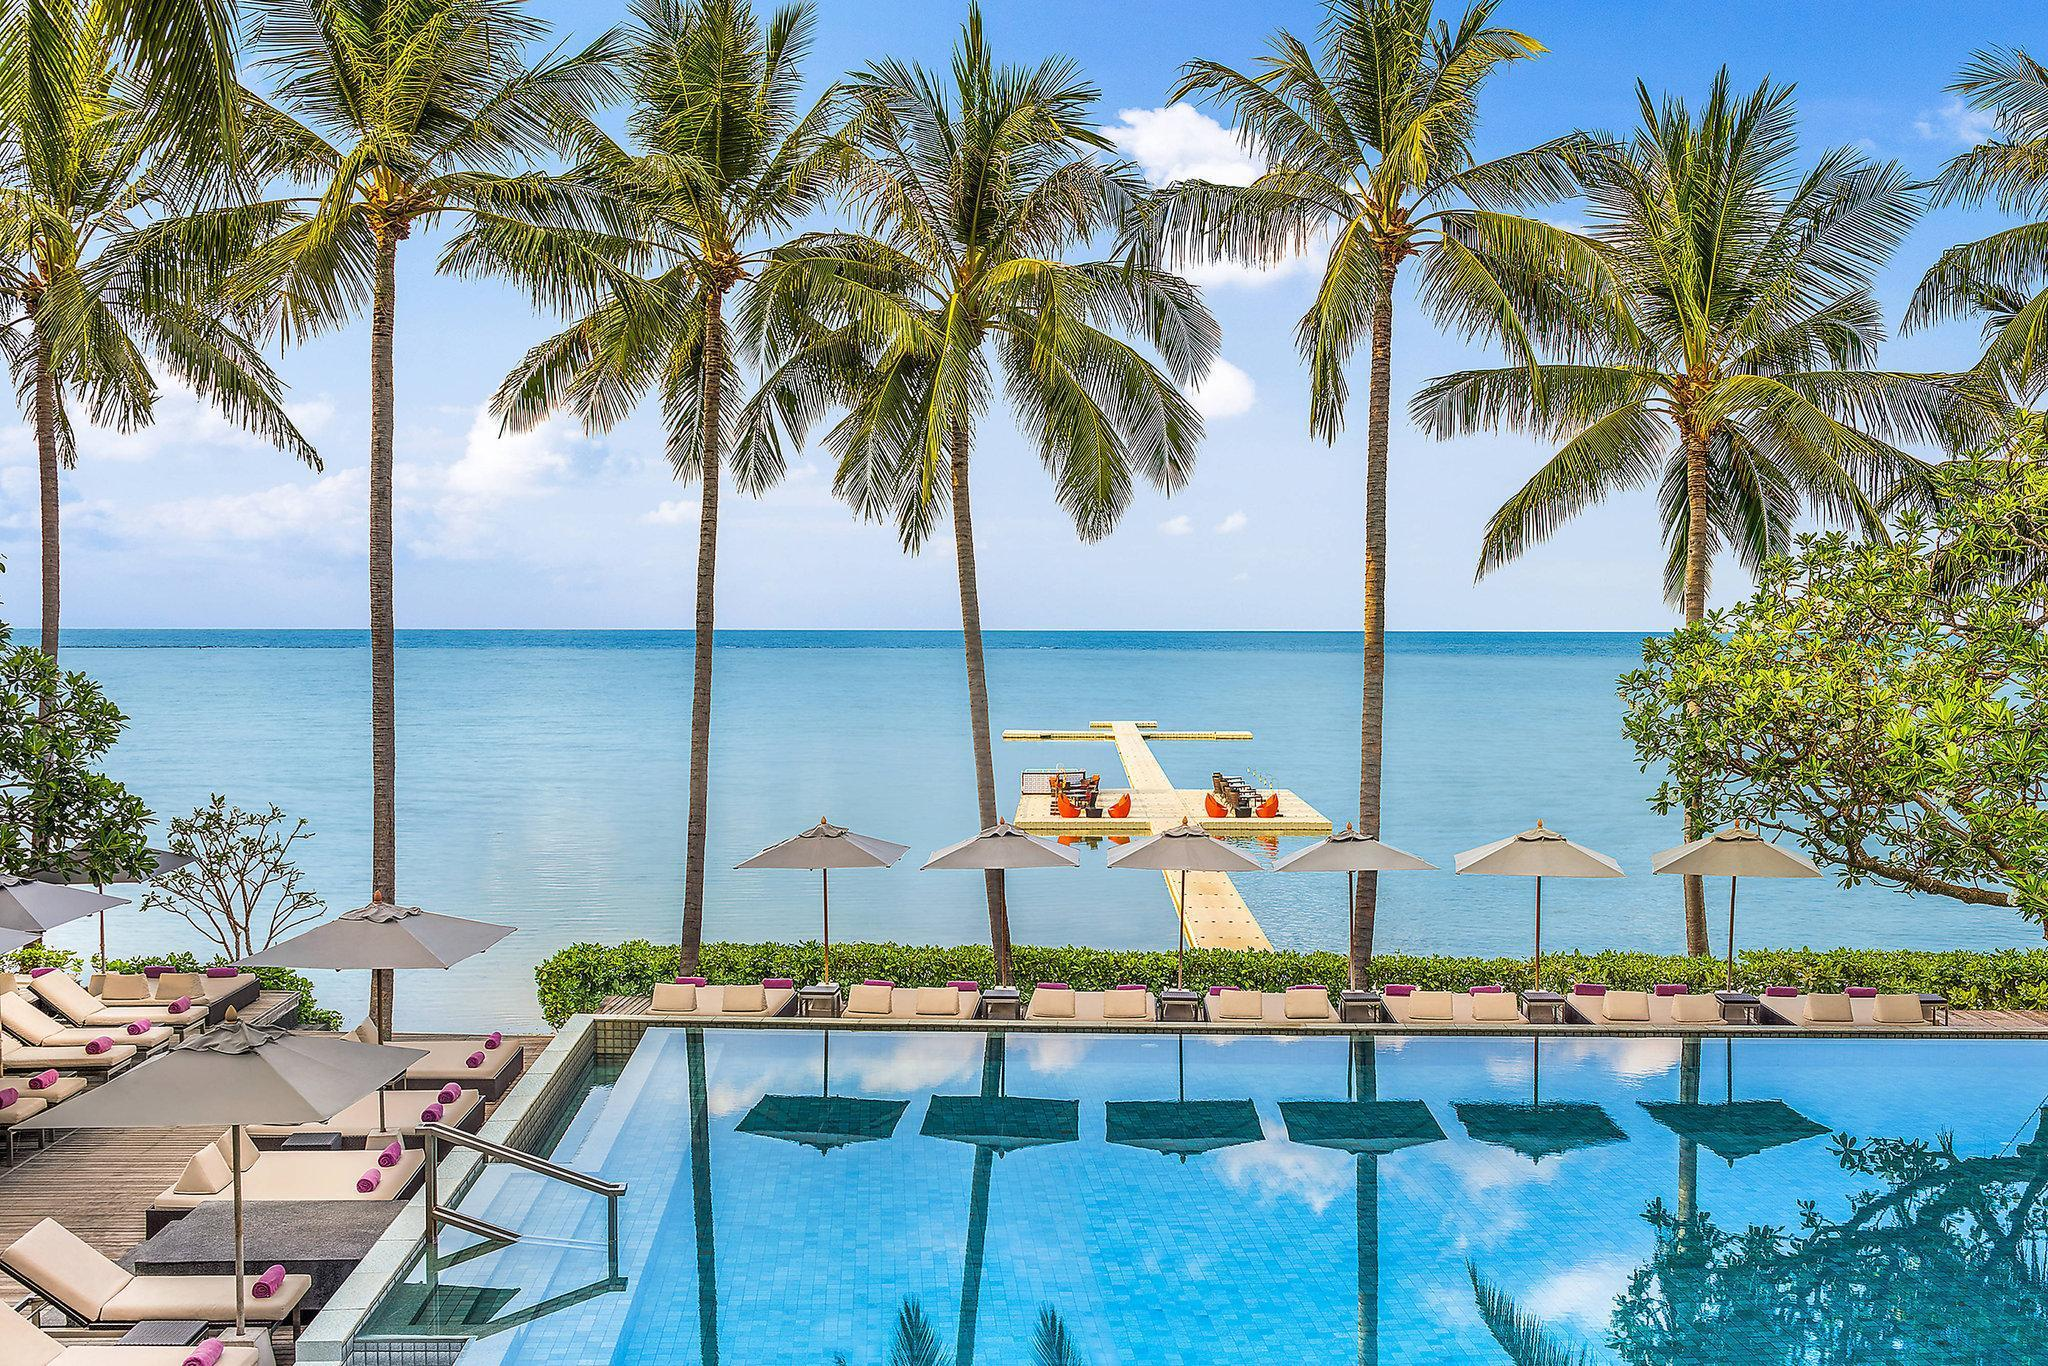 Le Méridien Koh Samui Resort & Spa เลอ เมริเดียน เกาะสมุย รีสอร์ต แอนด์ สปา